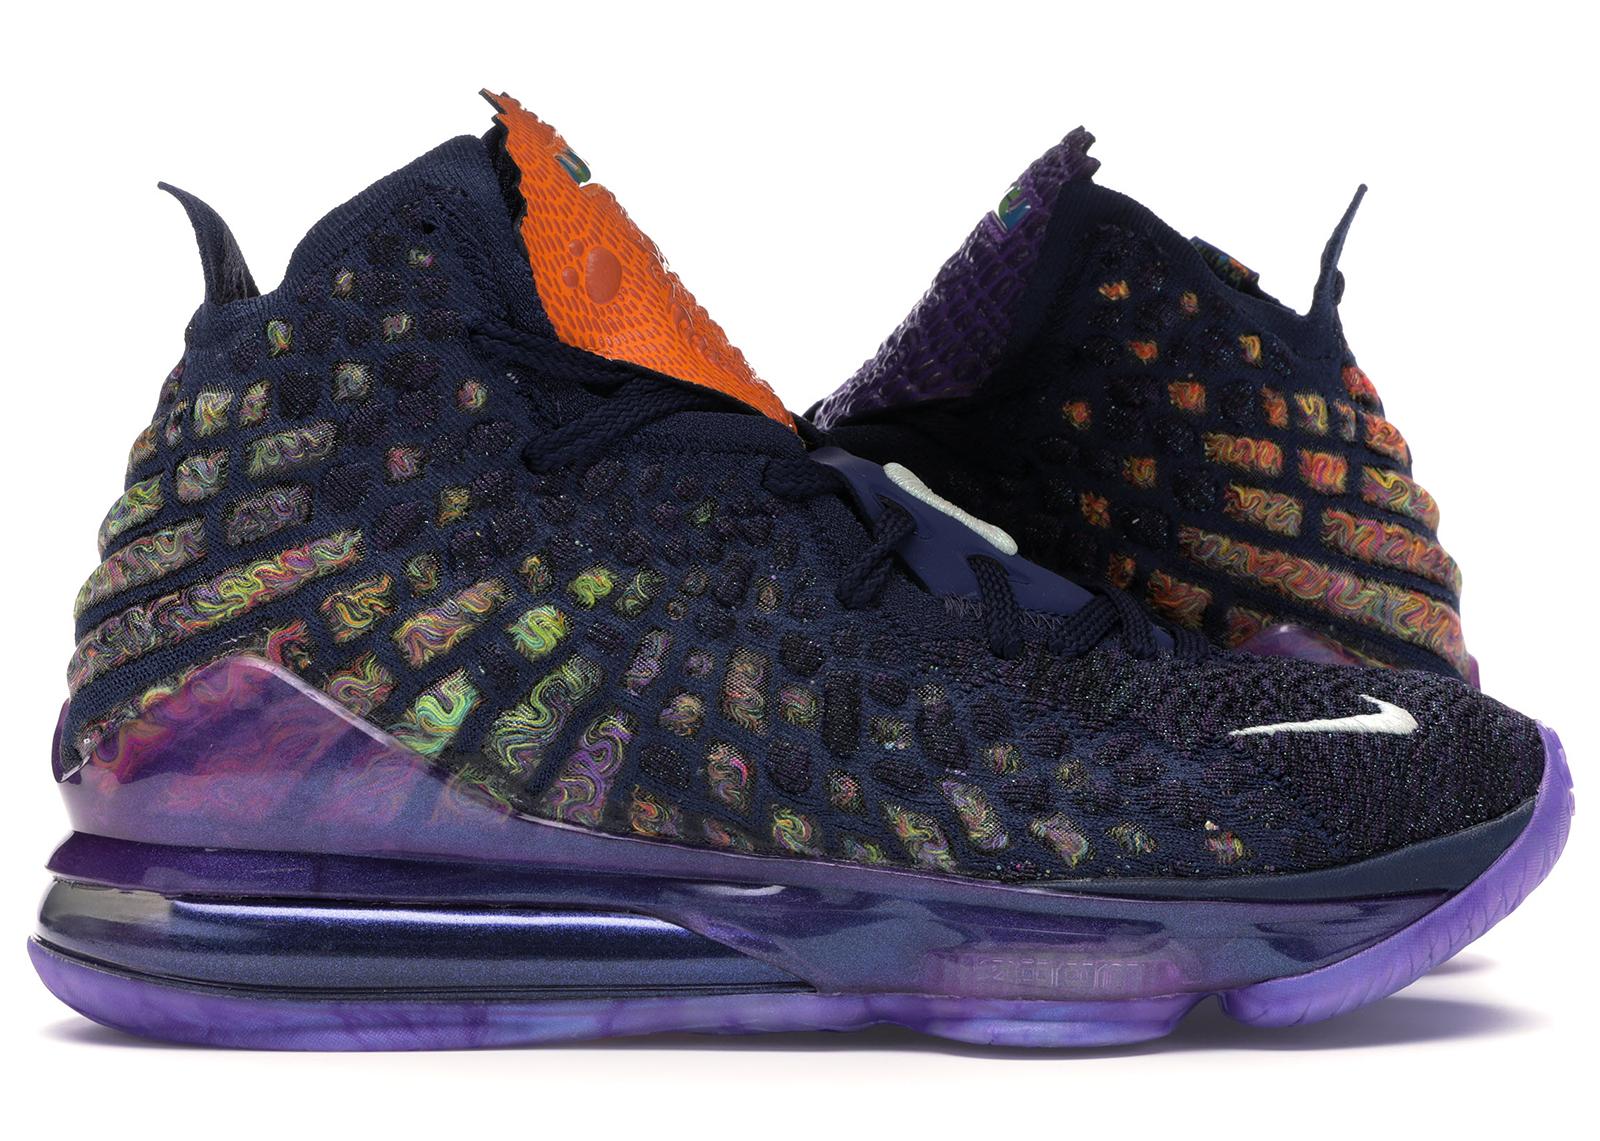 Nike LeBron 17 Monstars - CD5050-400